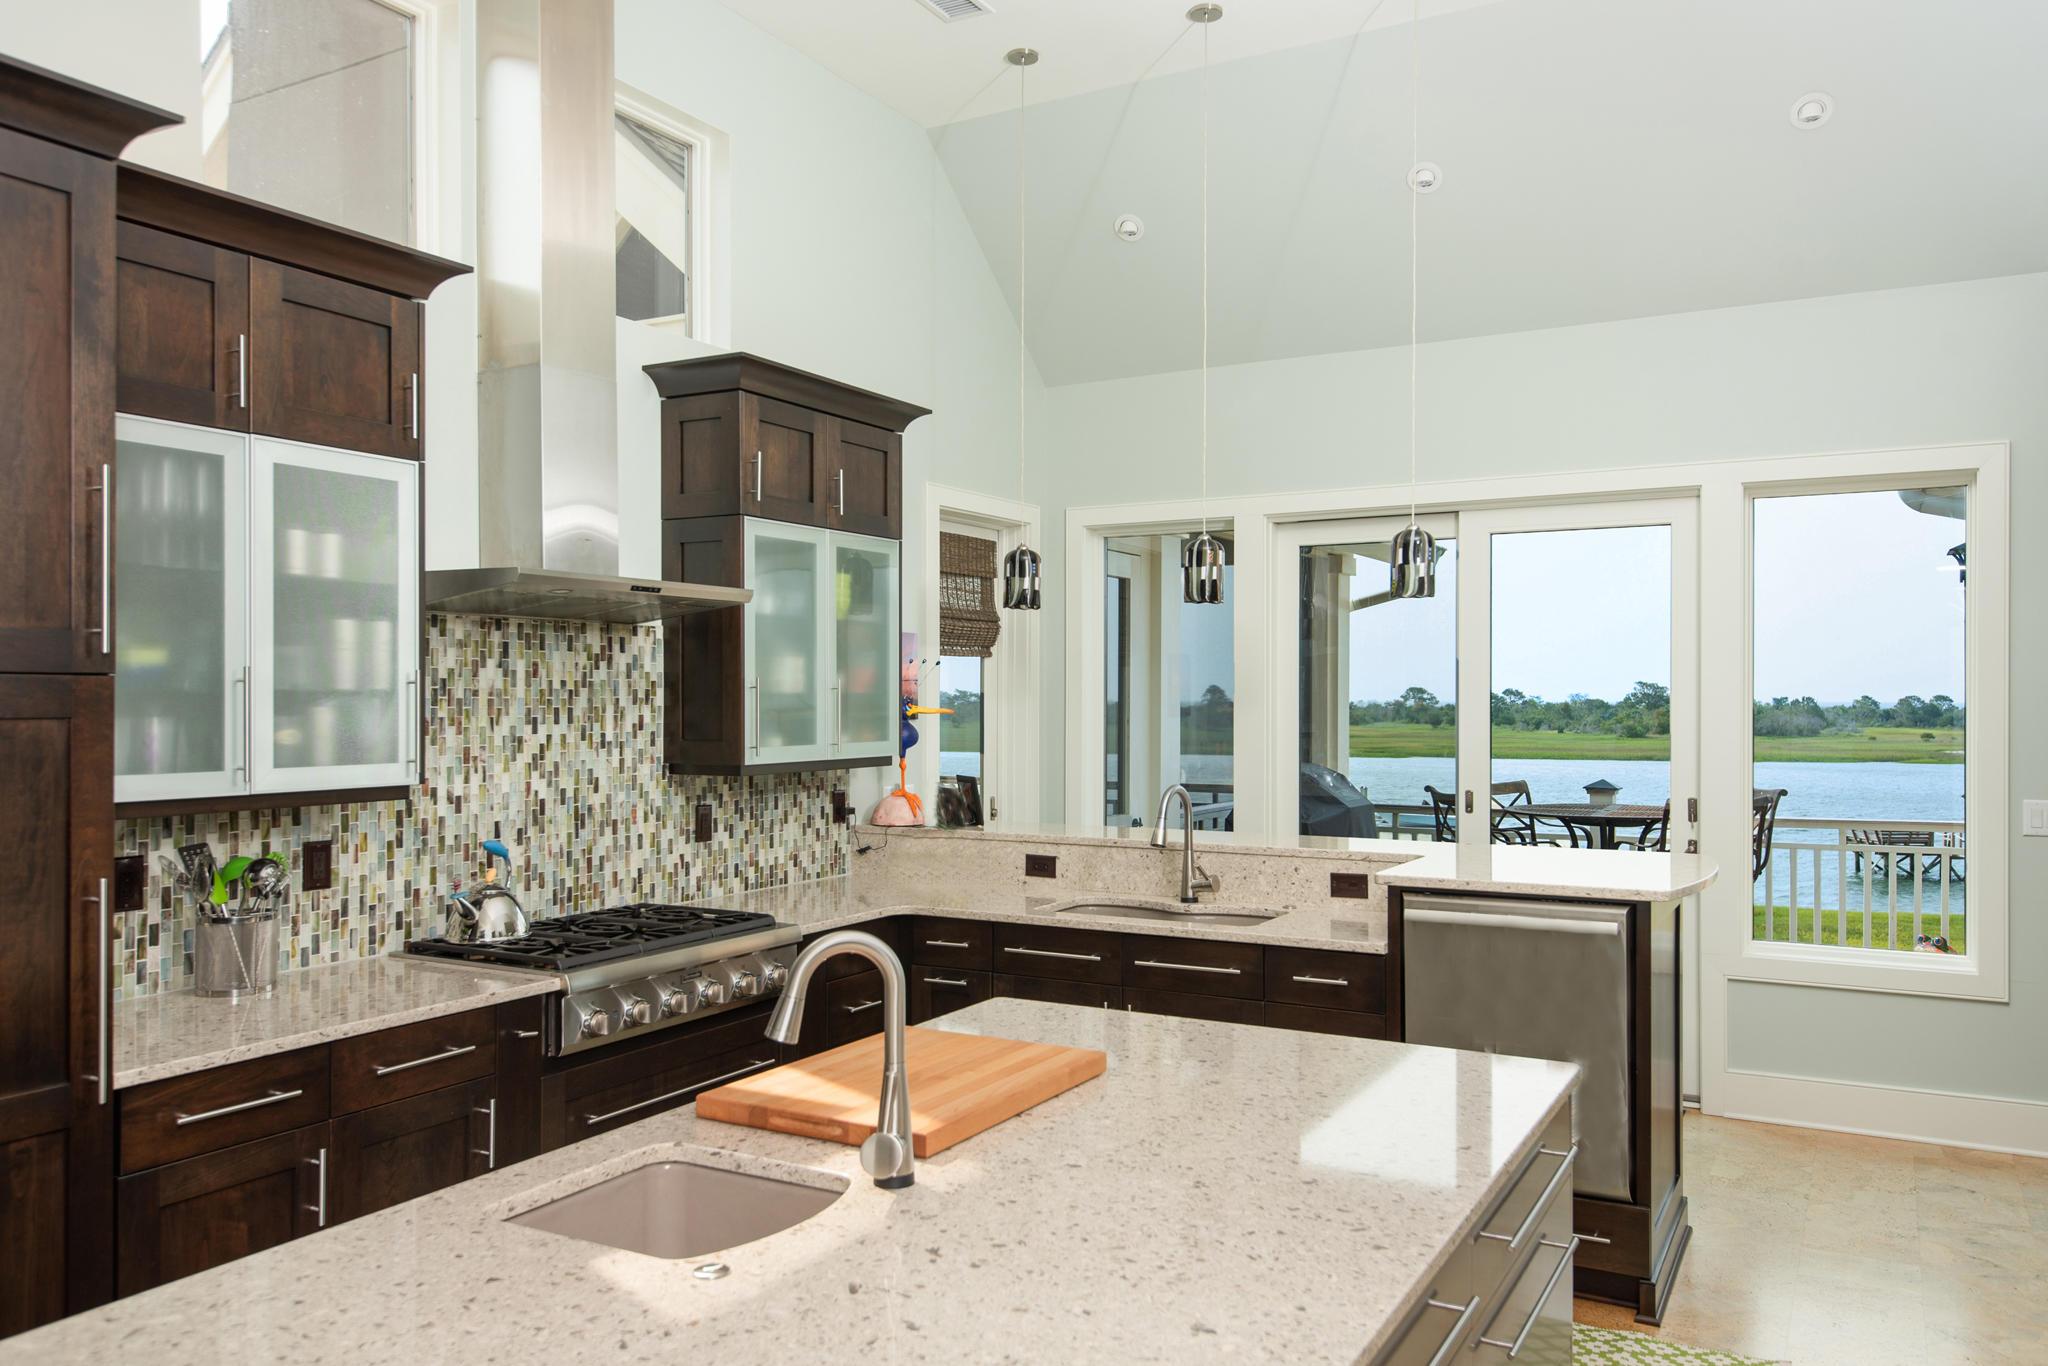 Seabrook Island Homes For Sale - 3135 Marshgate, Seabrook Island, SC - 52